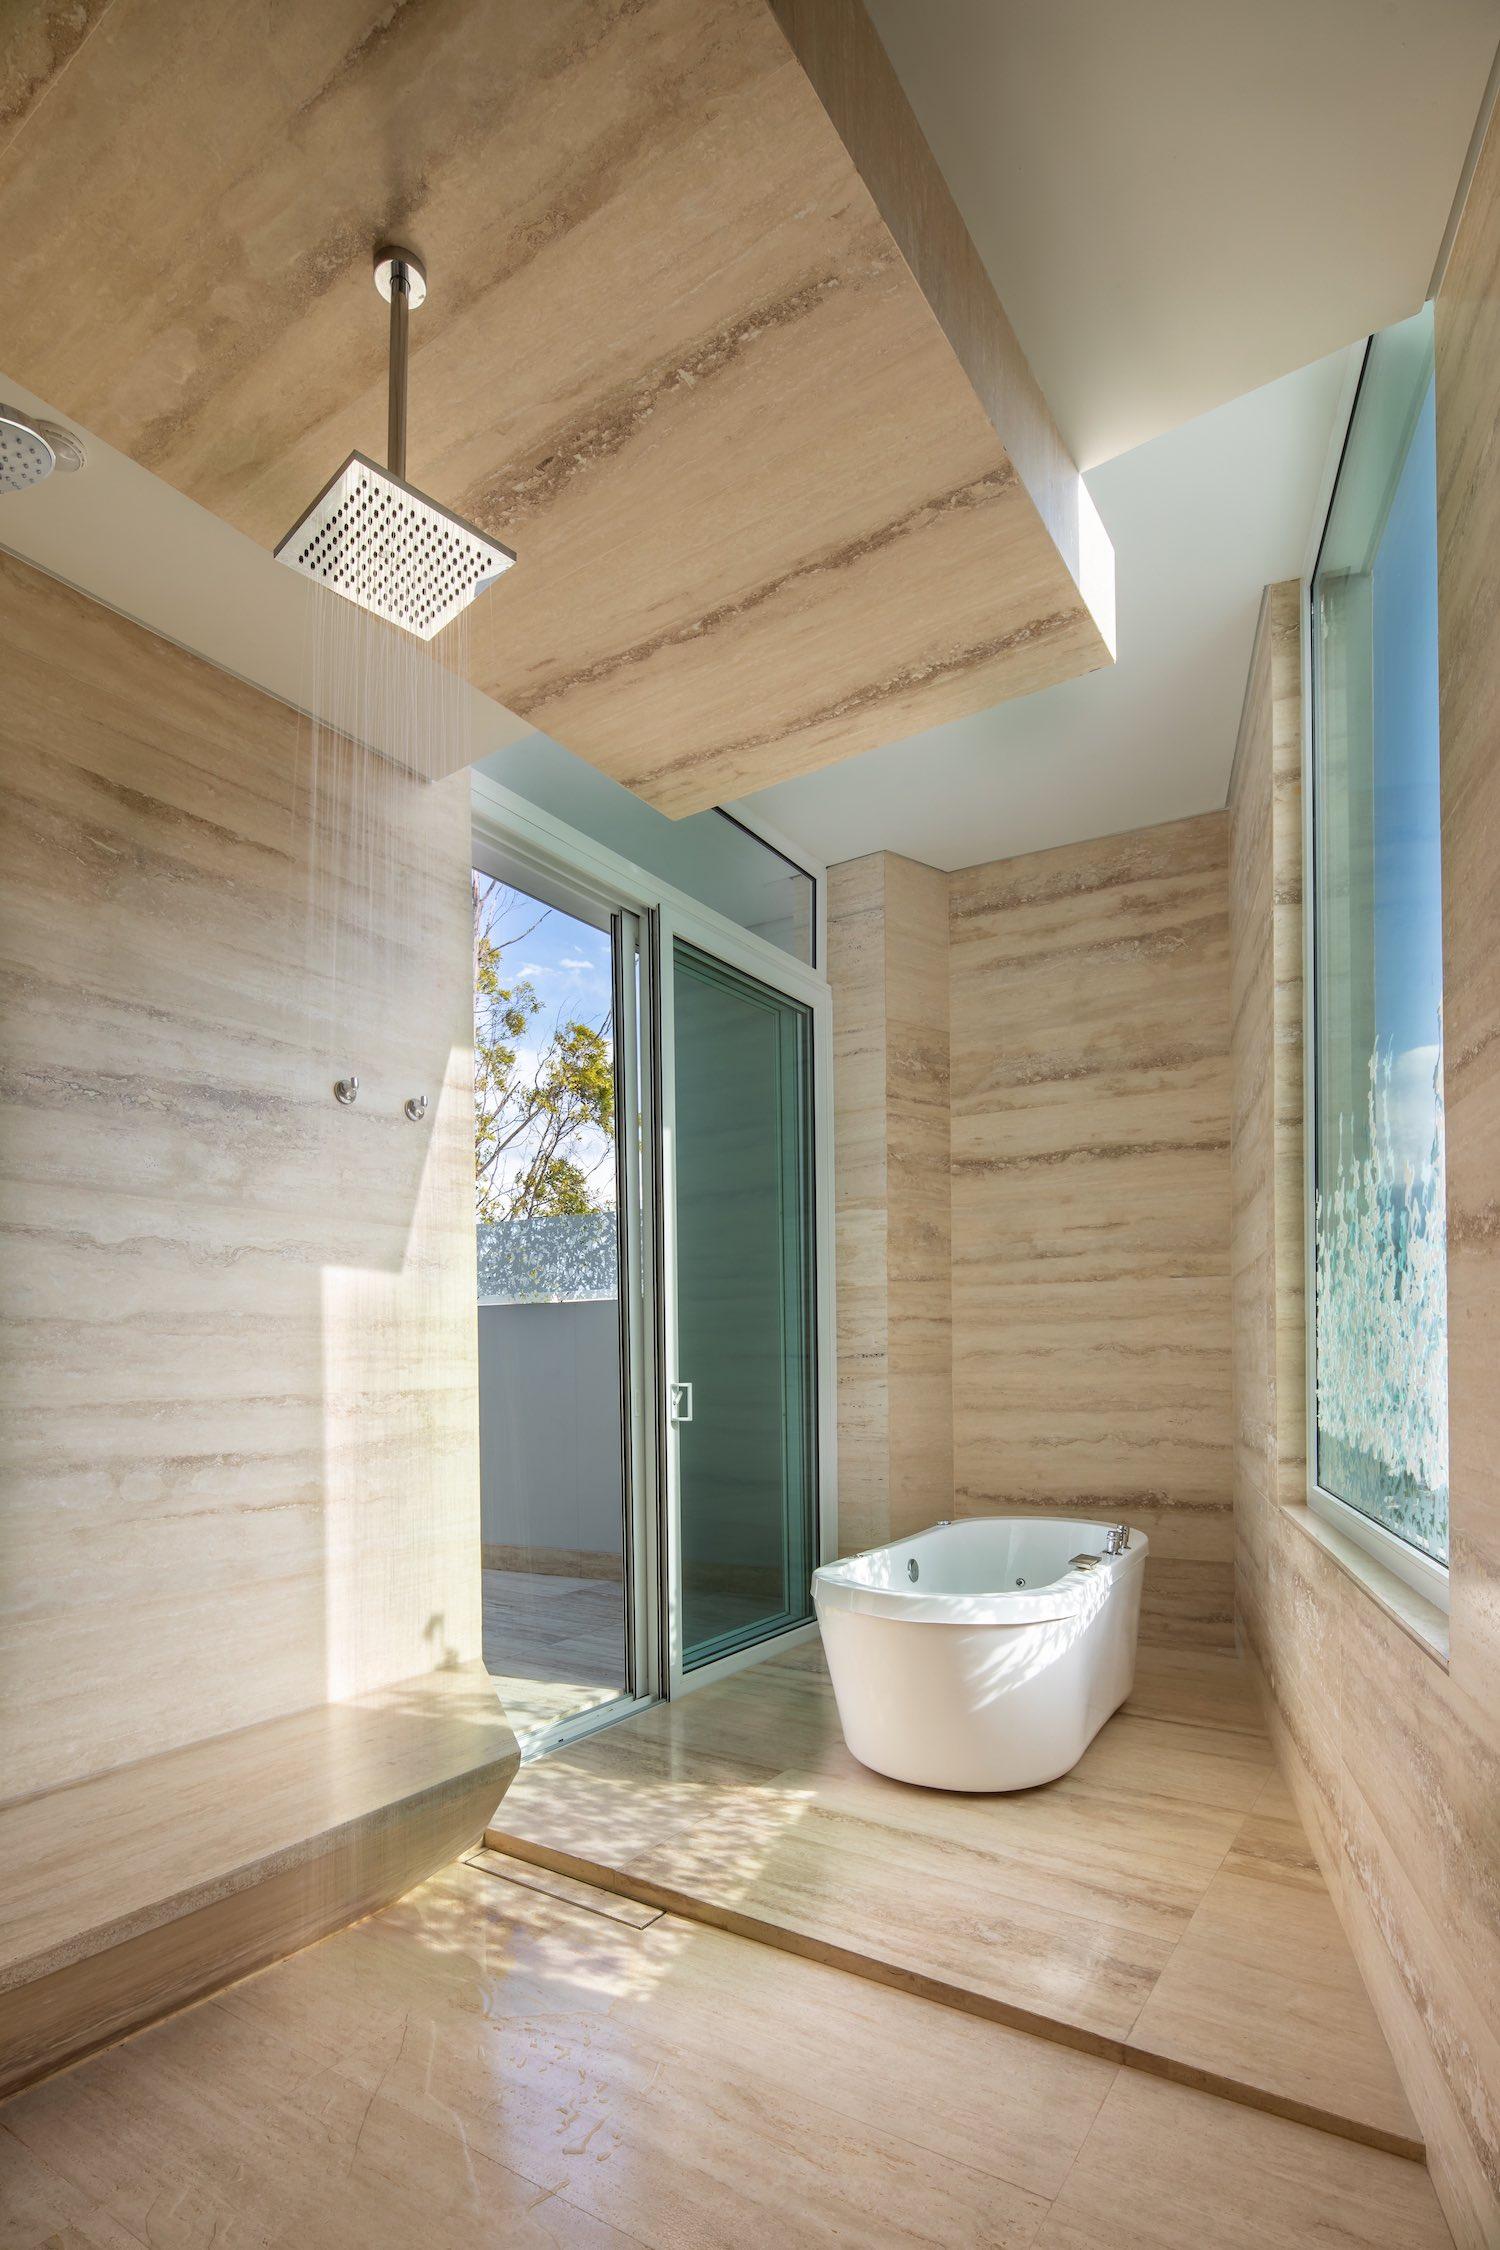 bathroom bathtub with open glass window